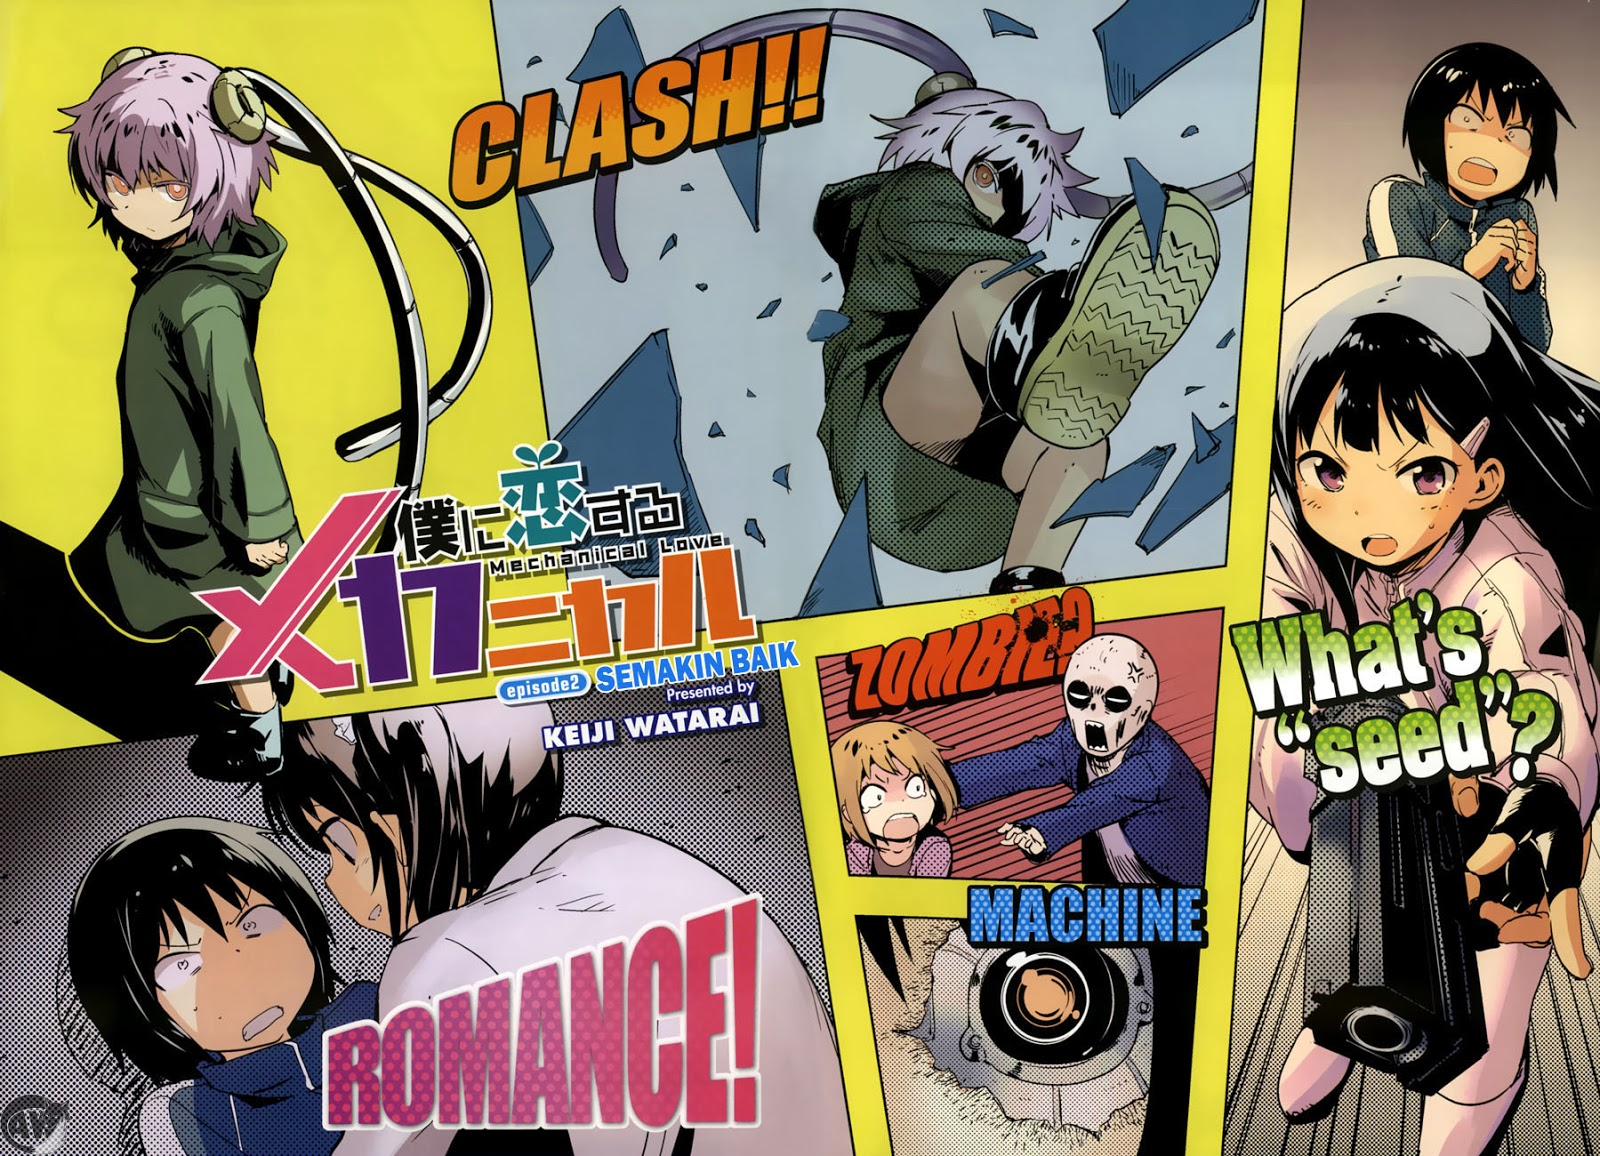 Komik mecha love 002 - semakin baik 3 Indonesia mecha love 002 - semakin baik Terbaru 1|Baca Manga Komik Indonesia|